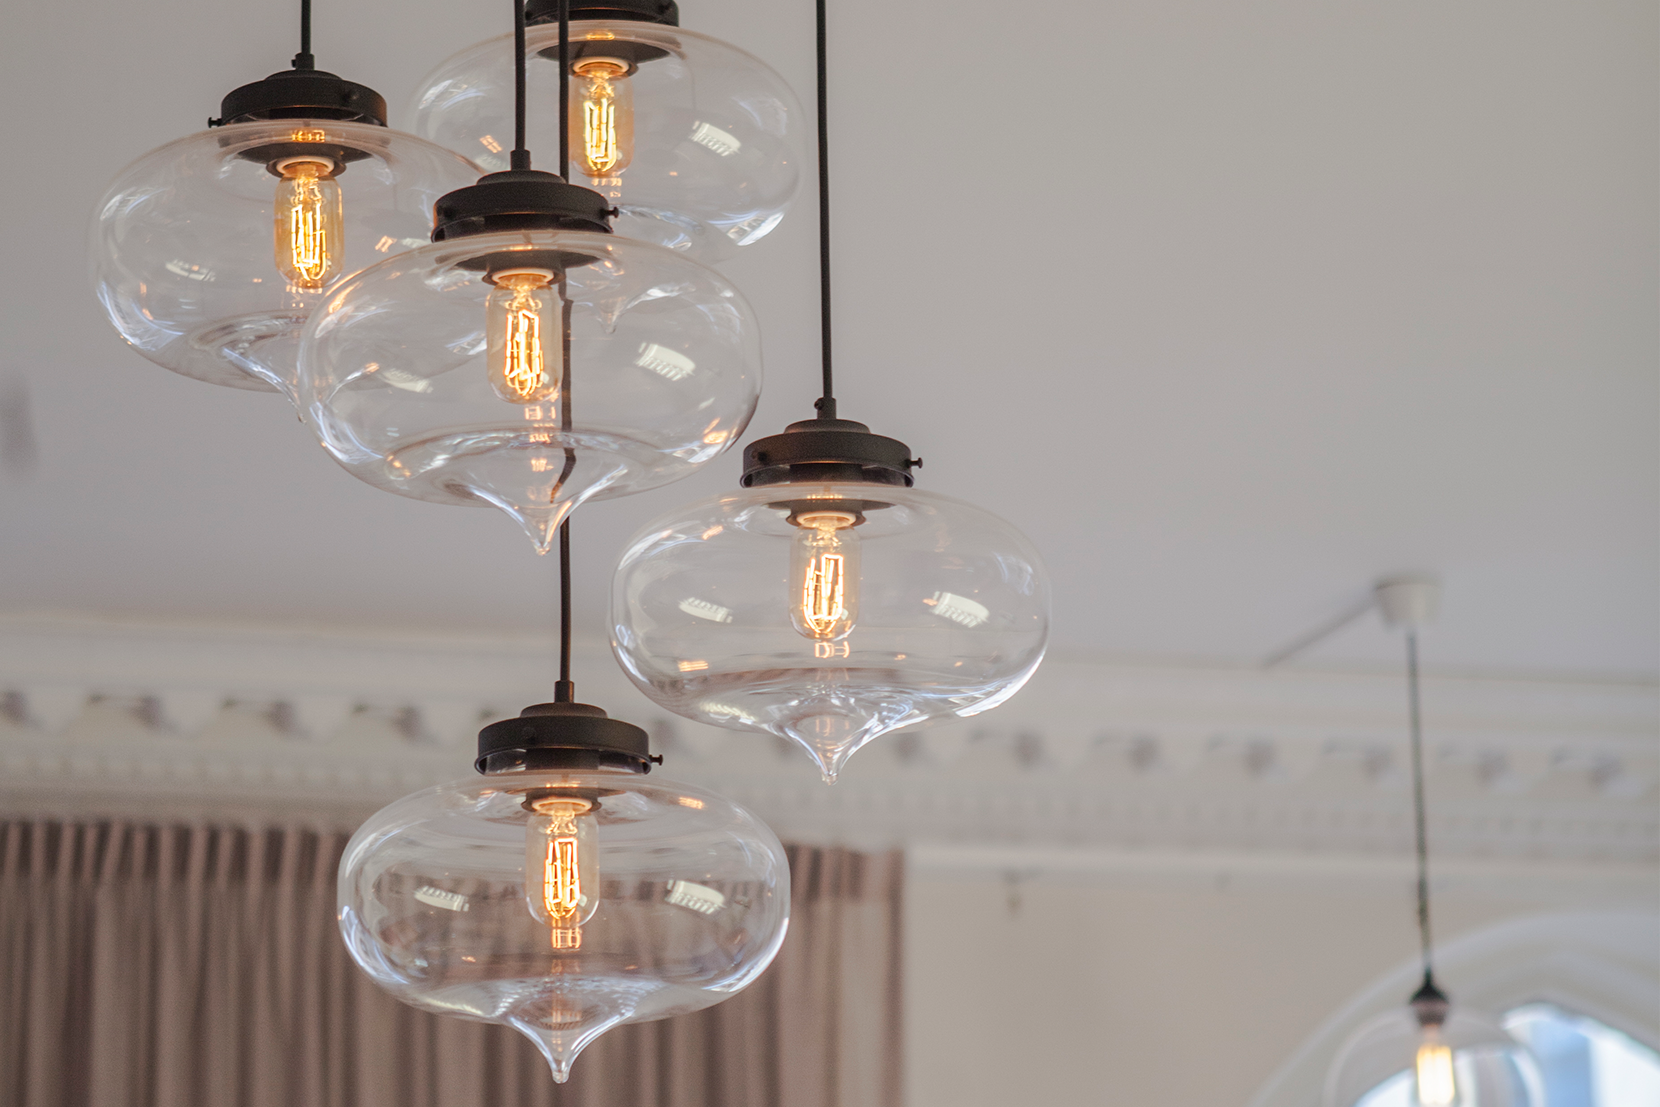 office chandelier lighting. + Read More Office Chandelier Lighting I